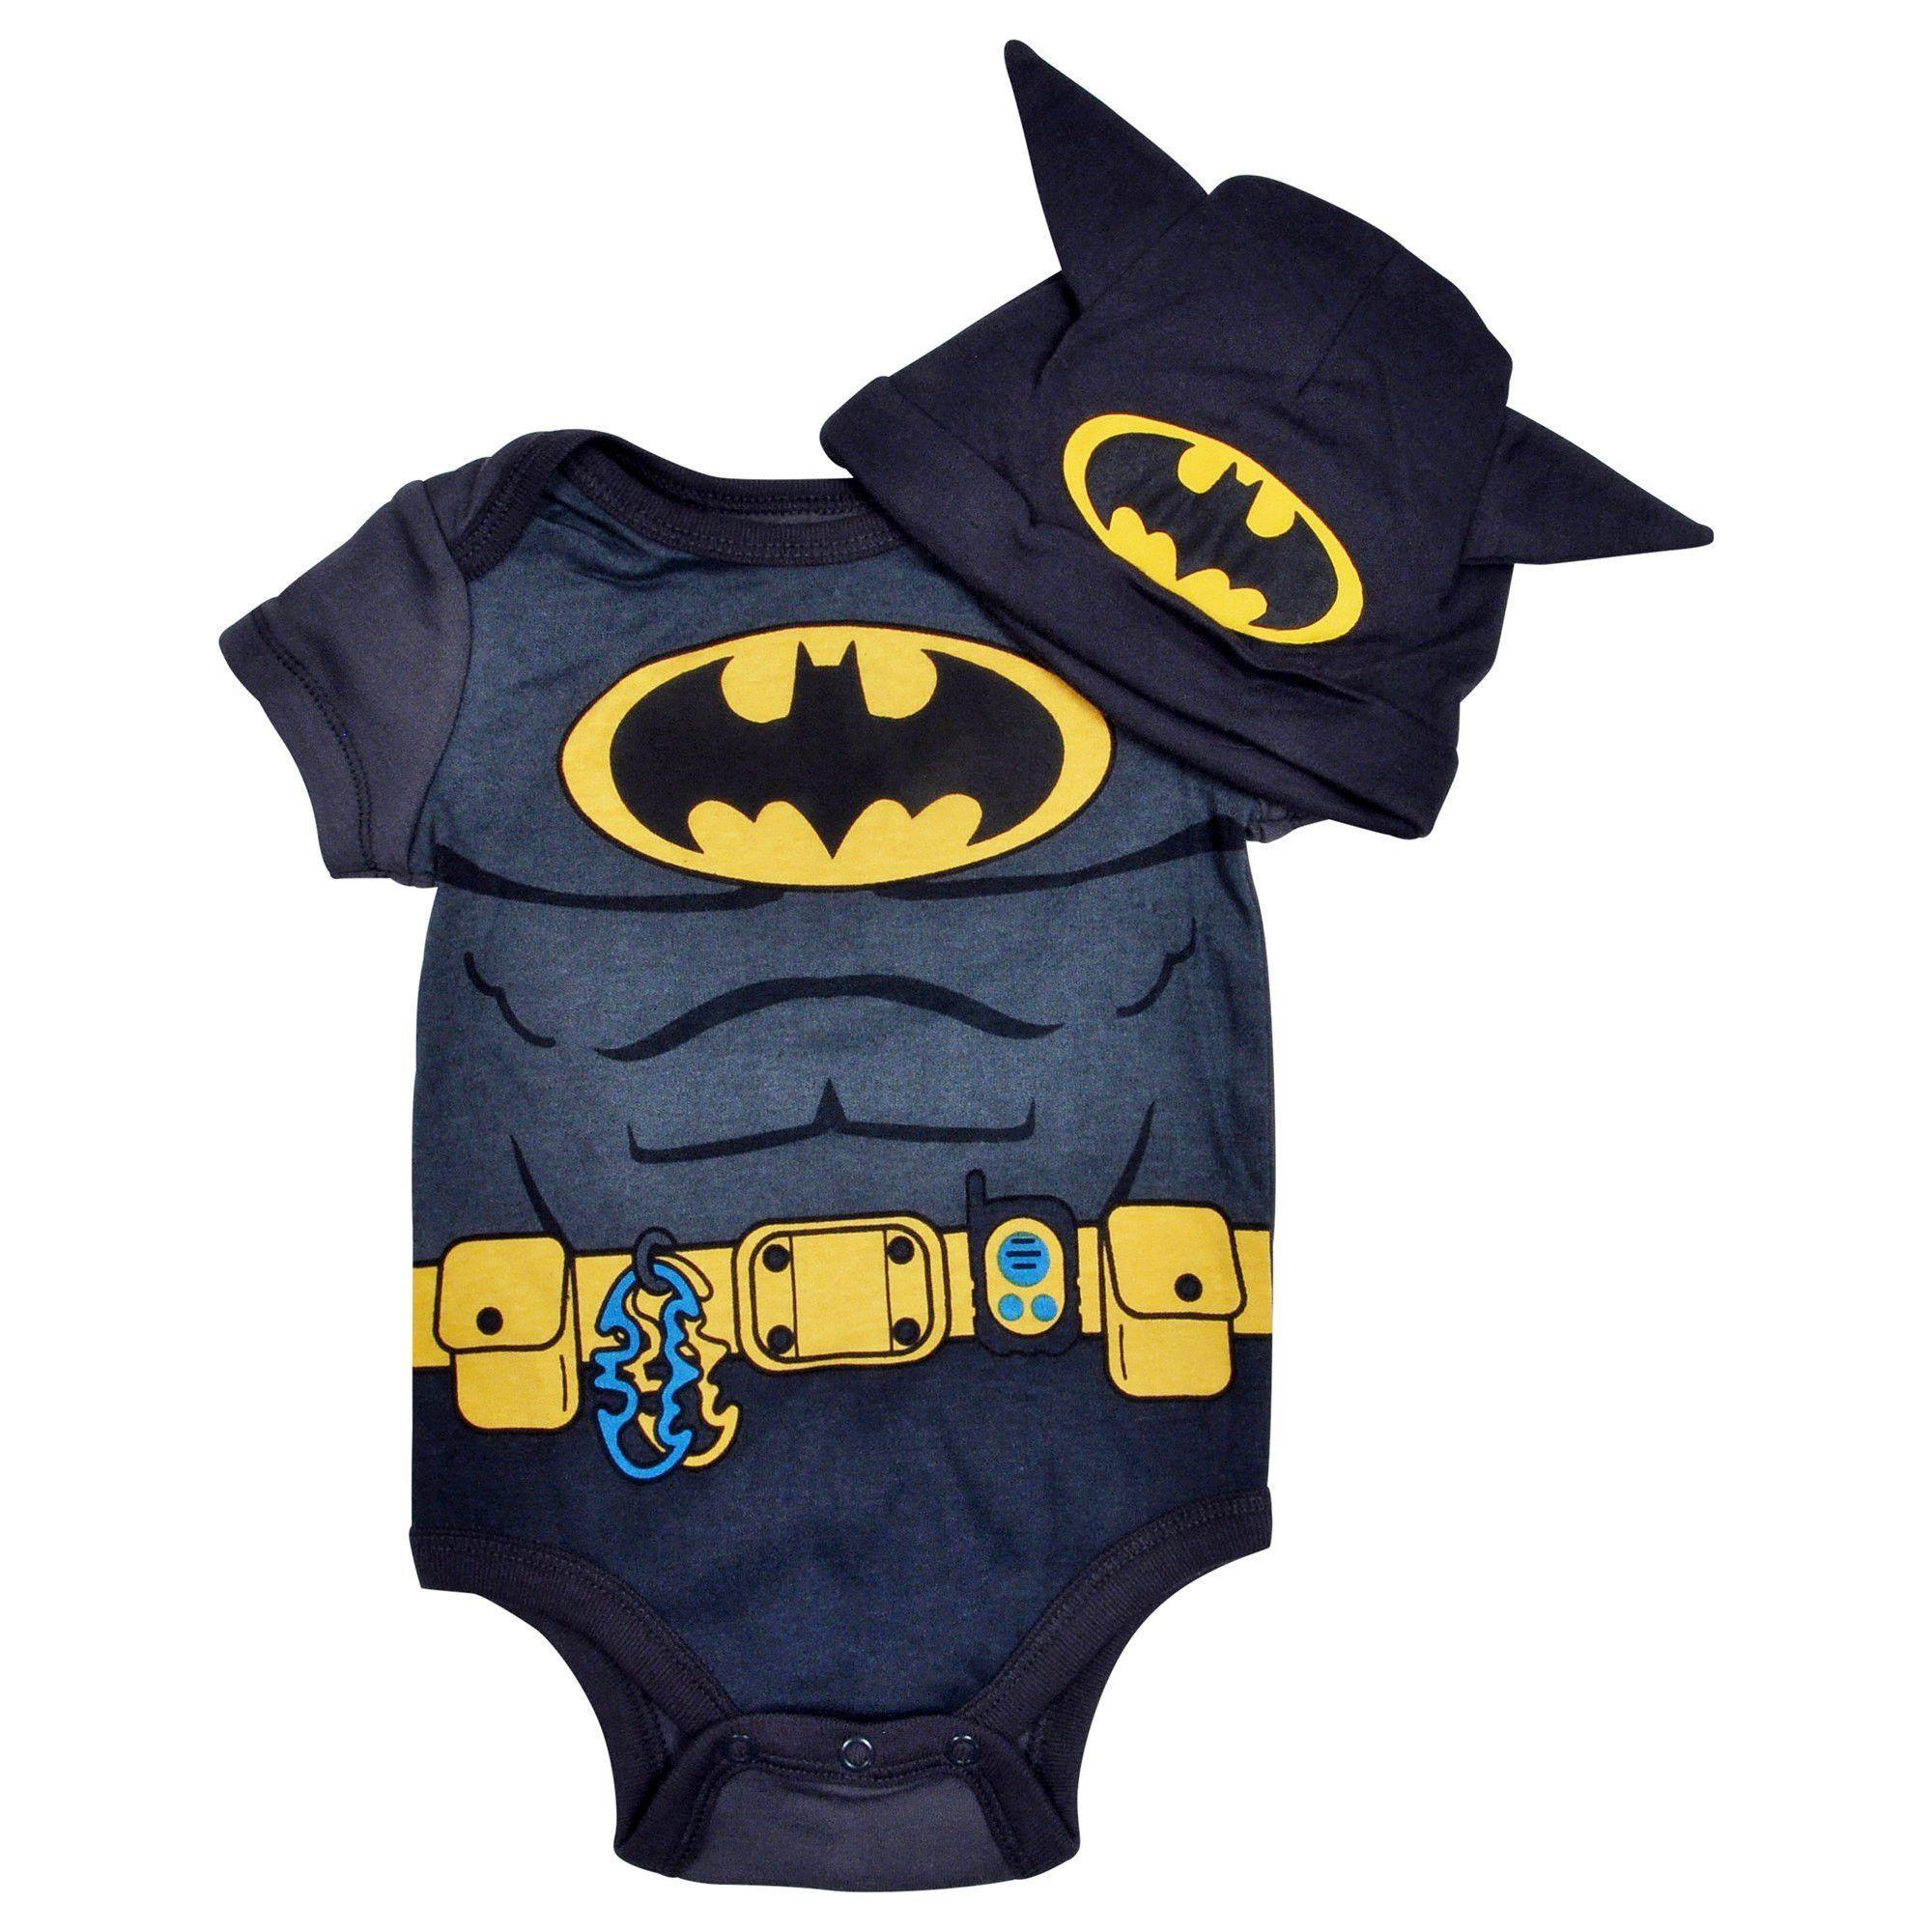 94e05013a2fb Newborn Baby Boys Batman One-Piece Bodysuit   Cap